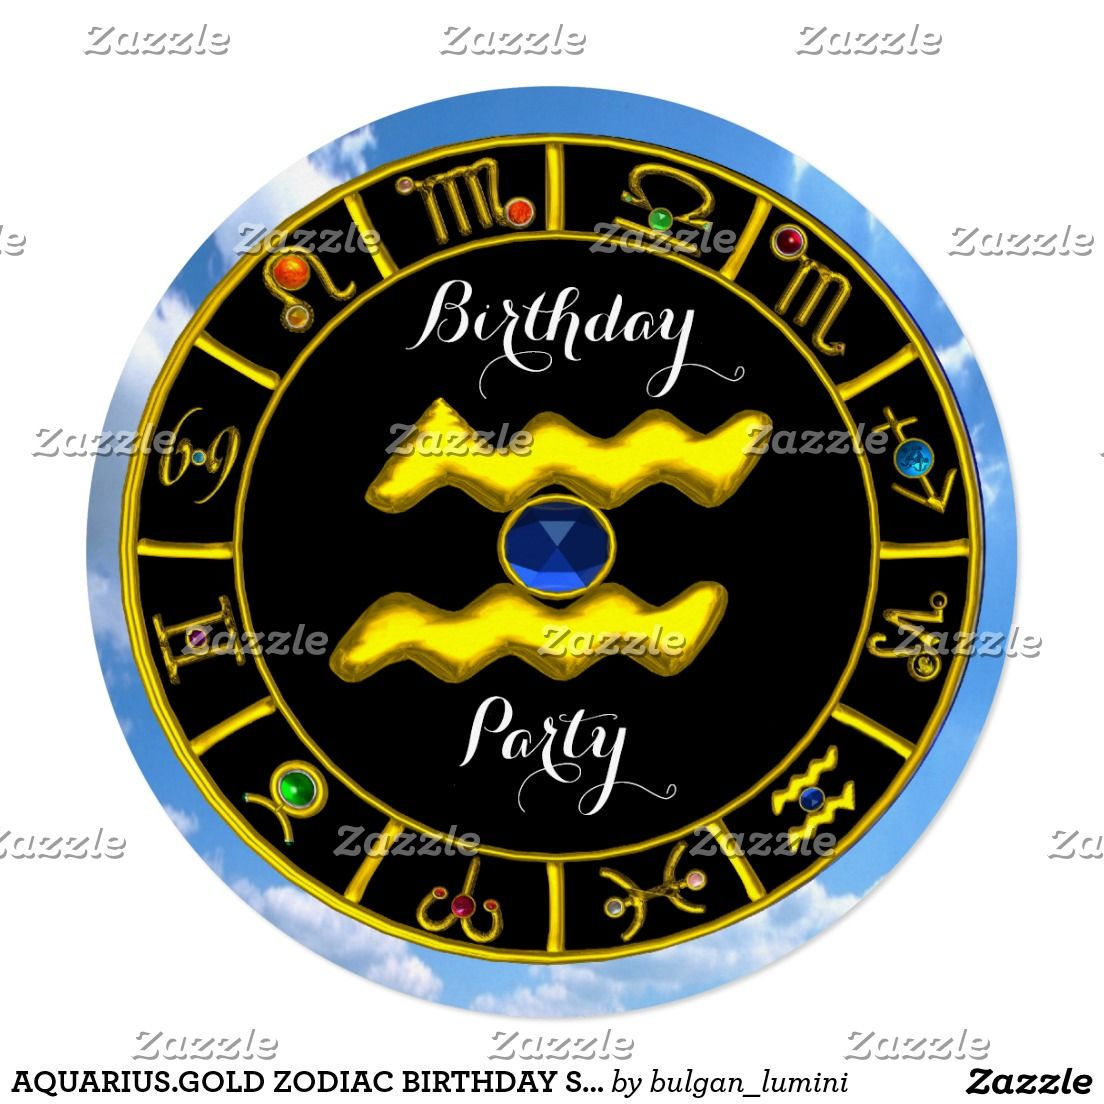 Aquariusgold zodiac birthday signastrology chart card by bulgan gold zodiac birthday signastrology chart card by bulgan lumini c nvjuhfo Image collections